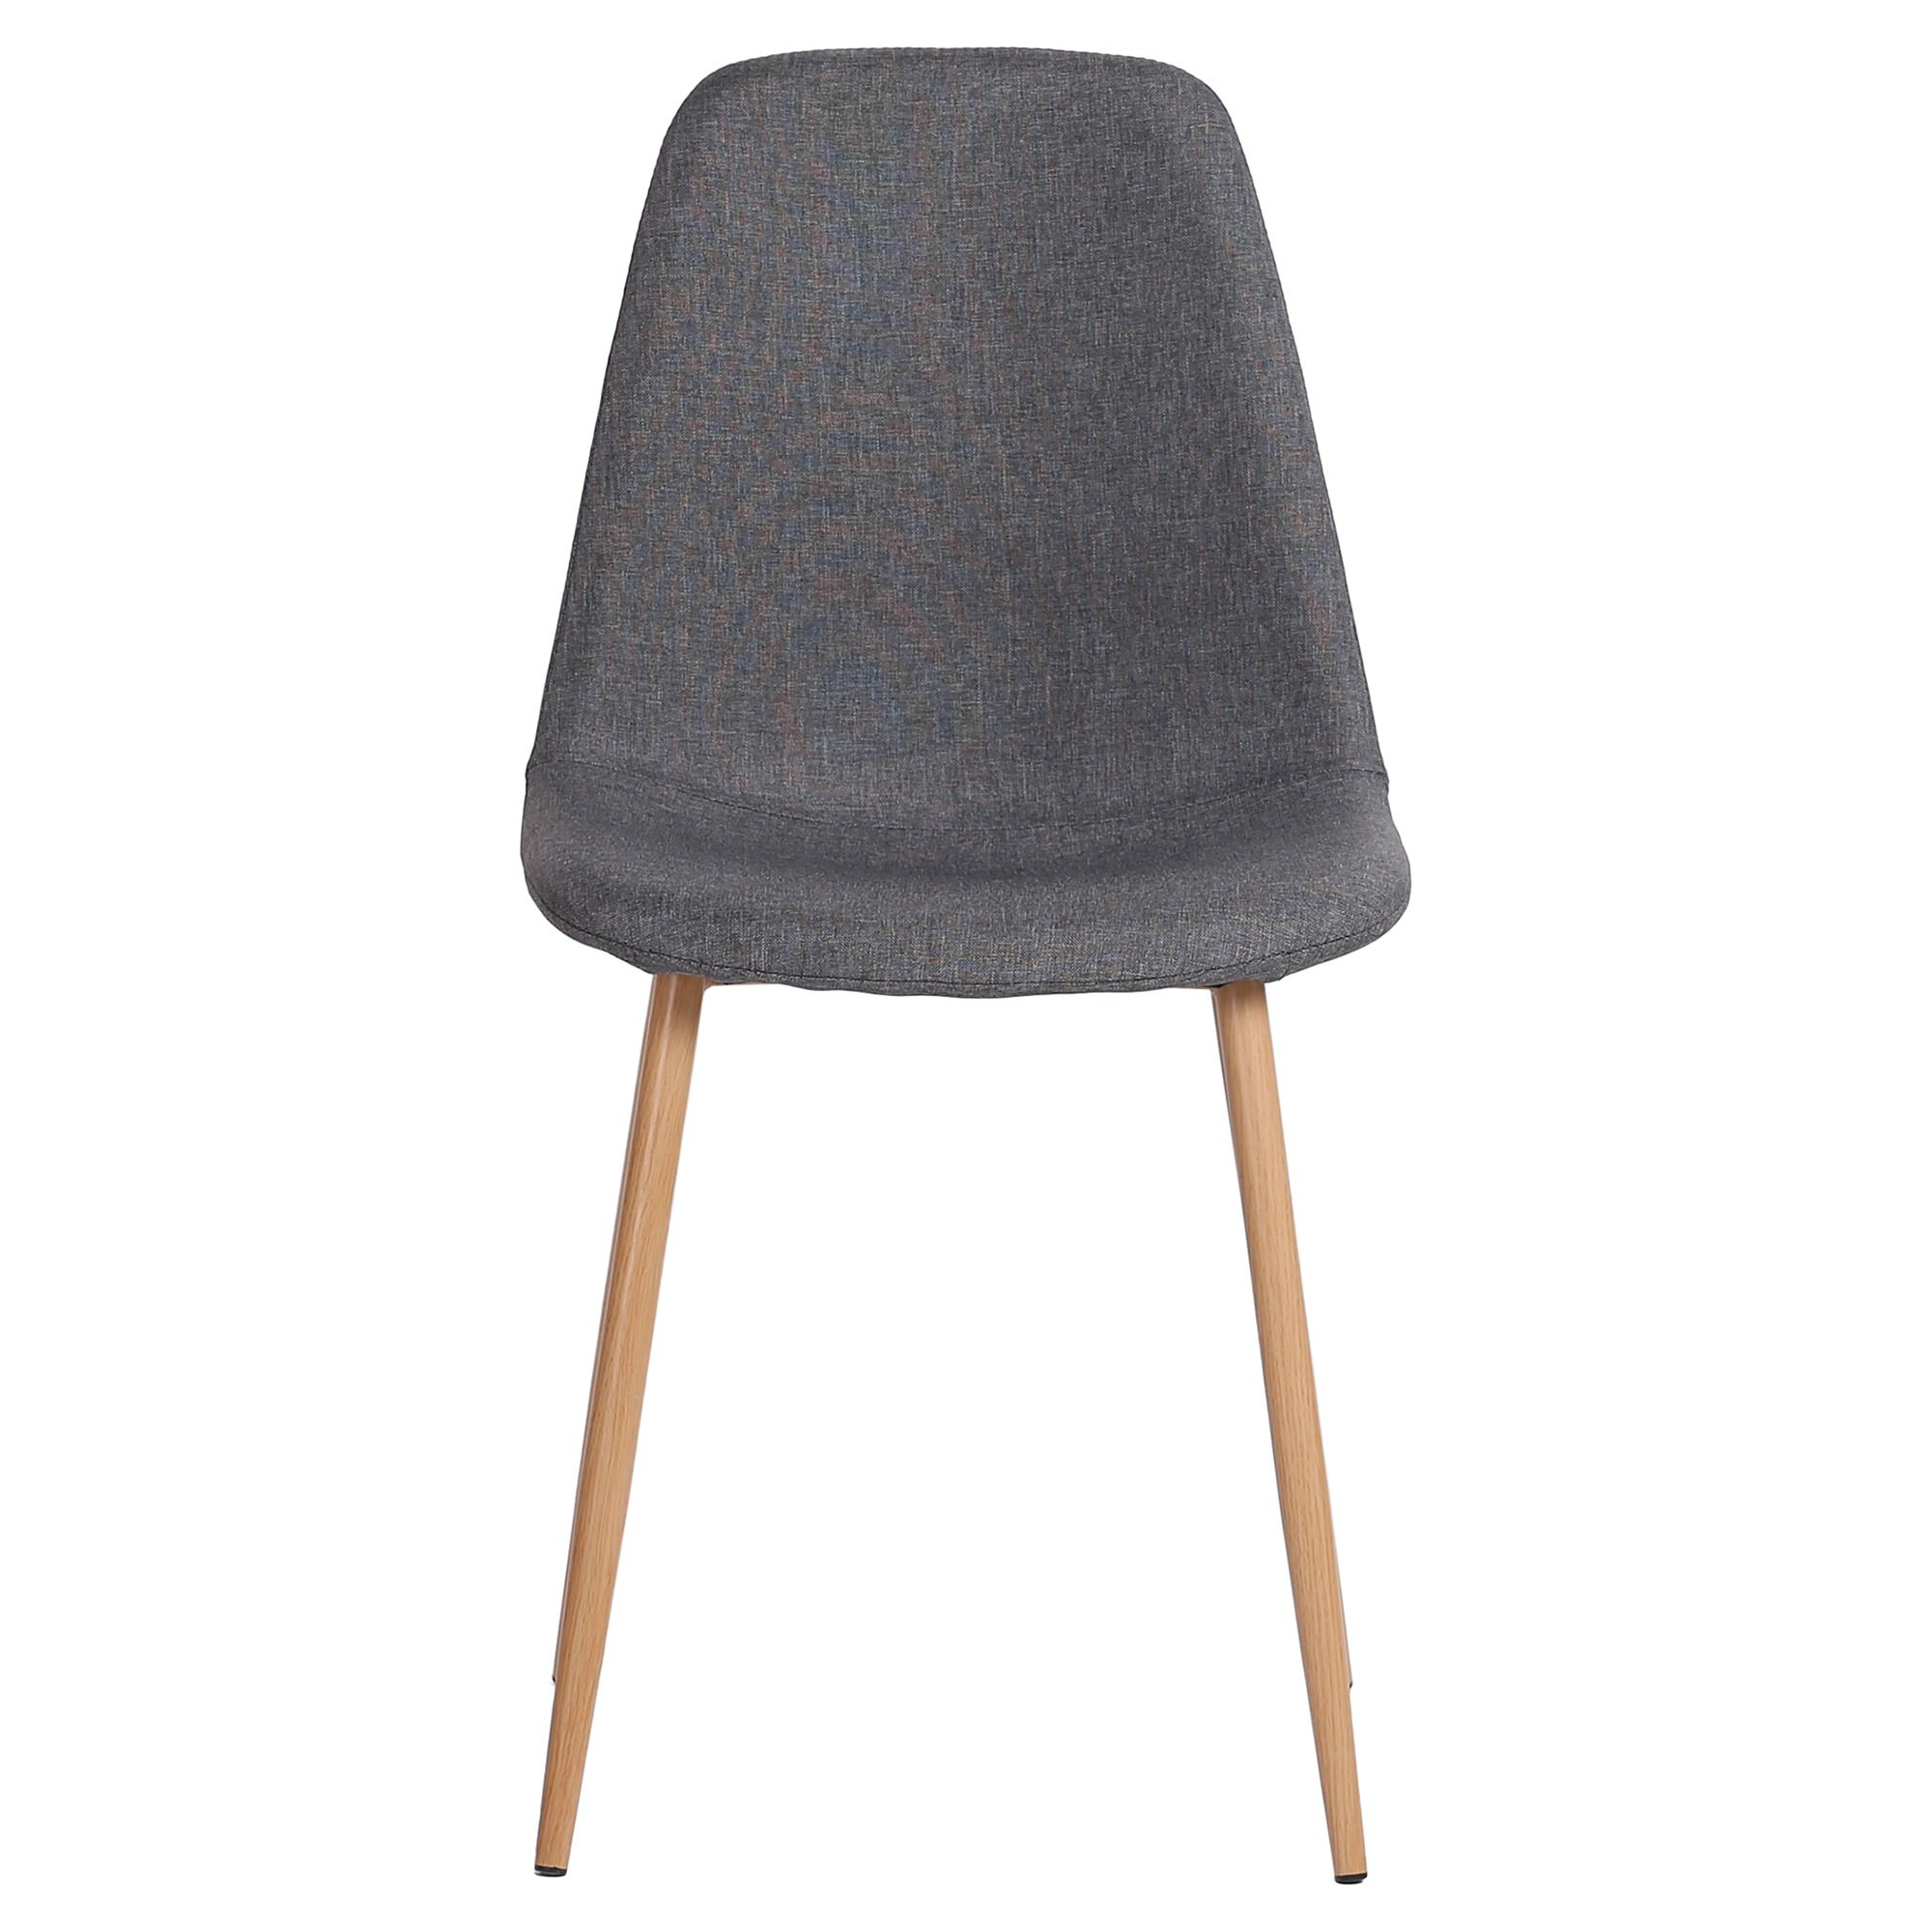 Zolfo Linen Fabric Dining Chair, Grey